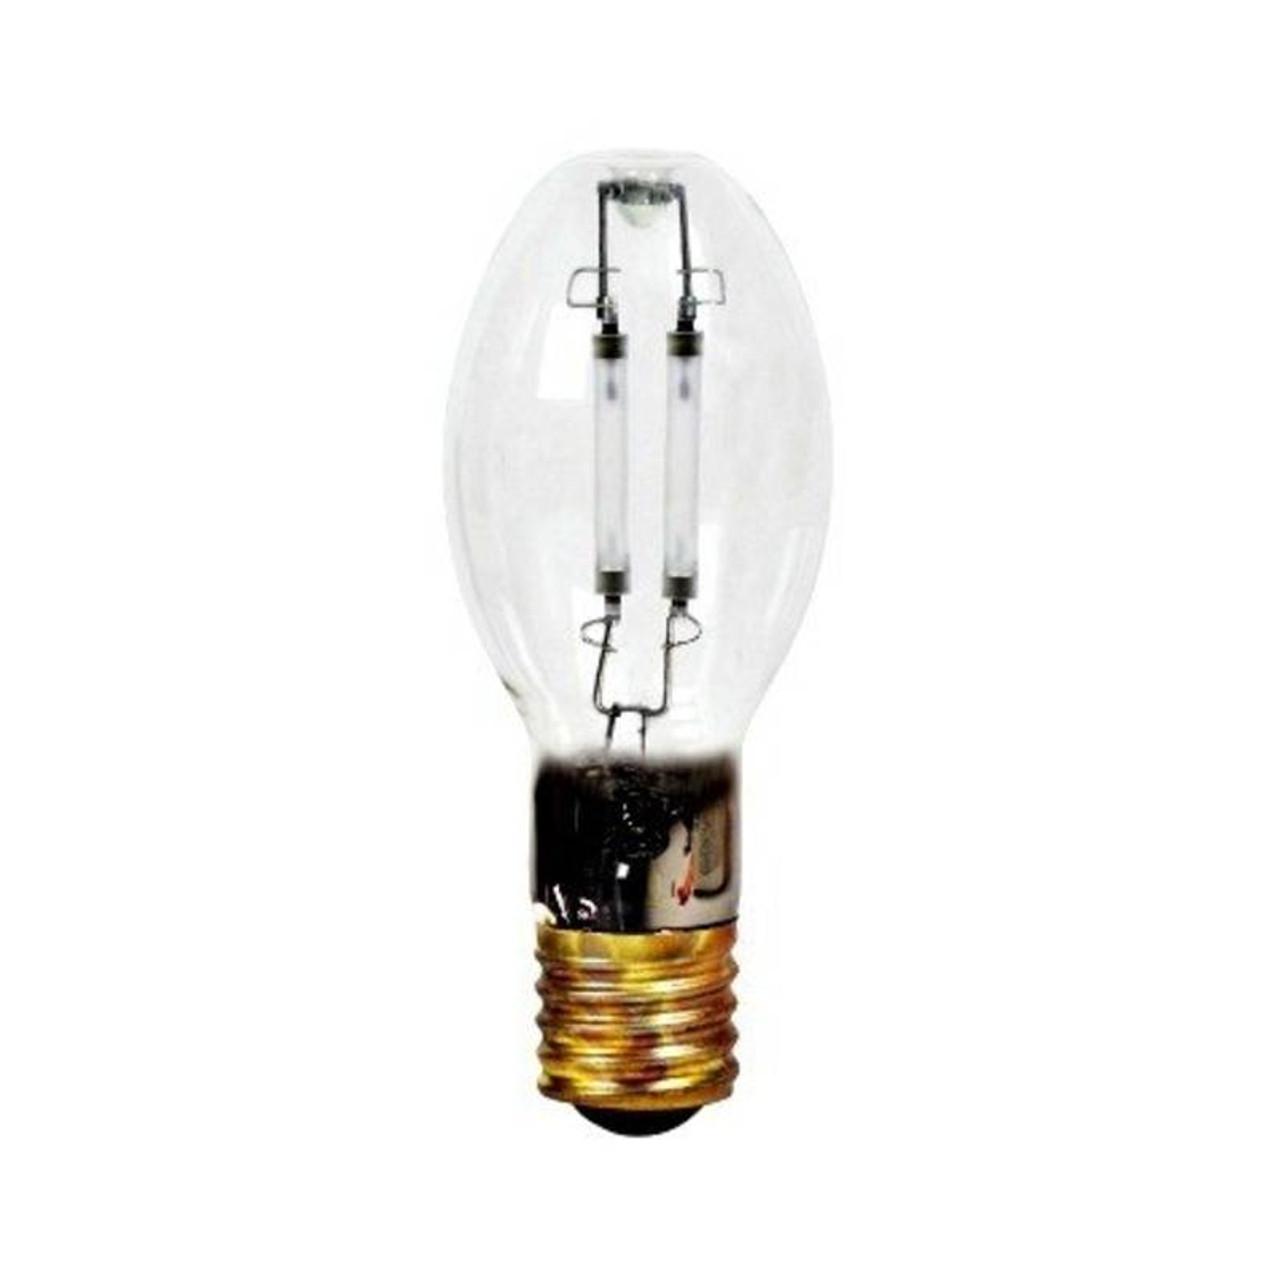 Lot of 4 Ceramalux C70S62//ALTO 70W HPS Hi Pressure Sodium Light Bulb Lamp MOGUL